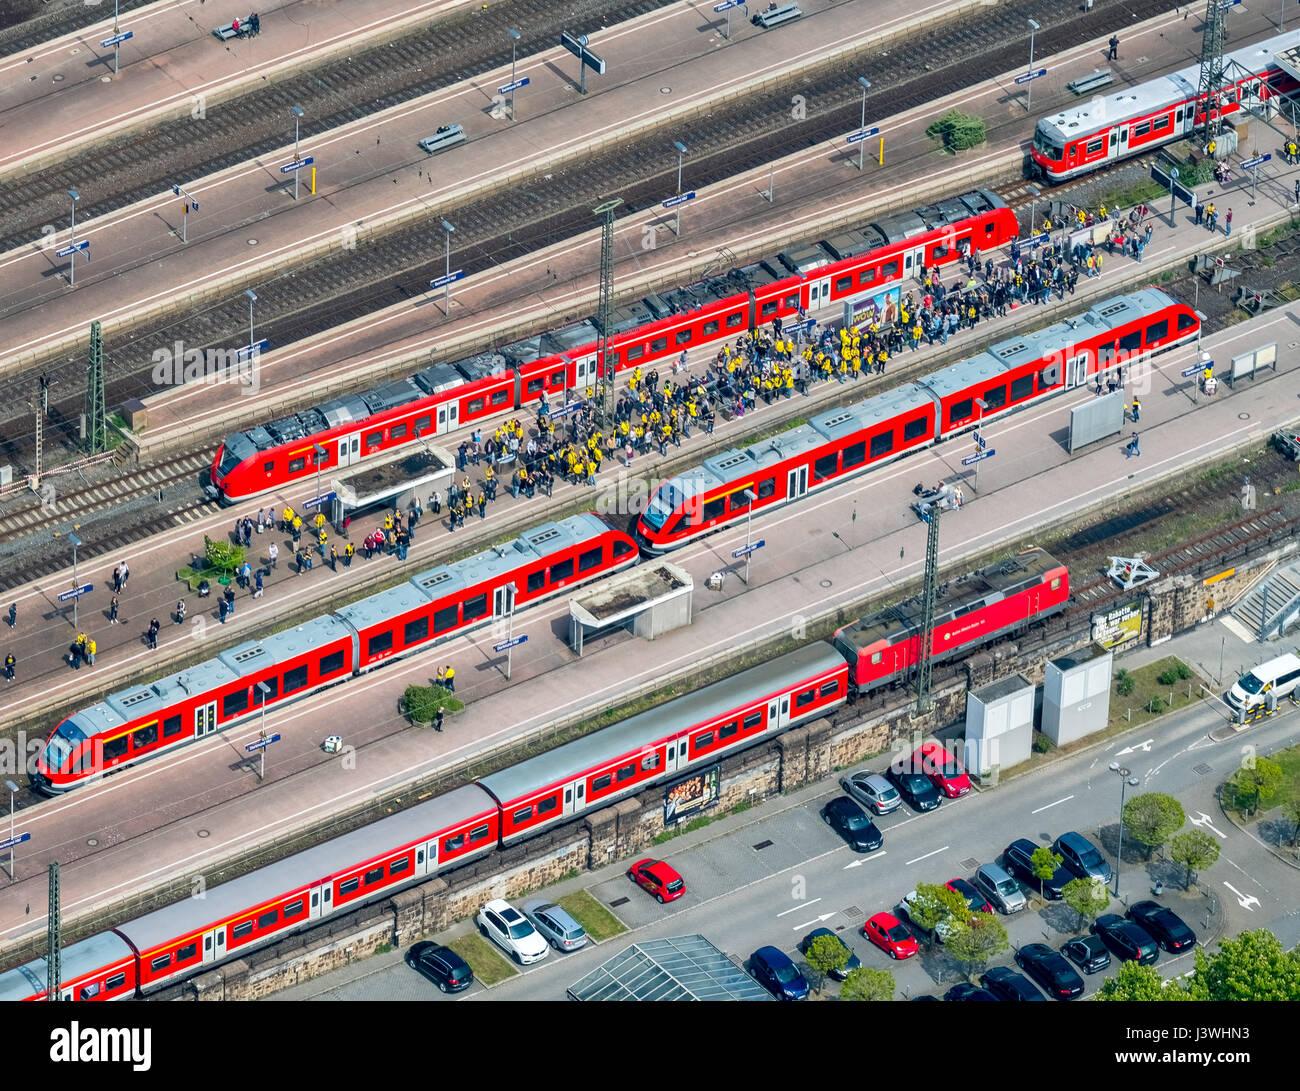 BVB fans on the S-Bahn railway, Dortmund main station, red S-Bahn, Dortmund, Ruhr area, North Rhine-Westphalia, Stock Photo